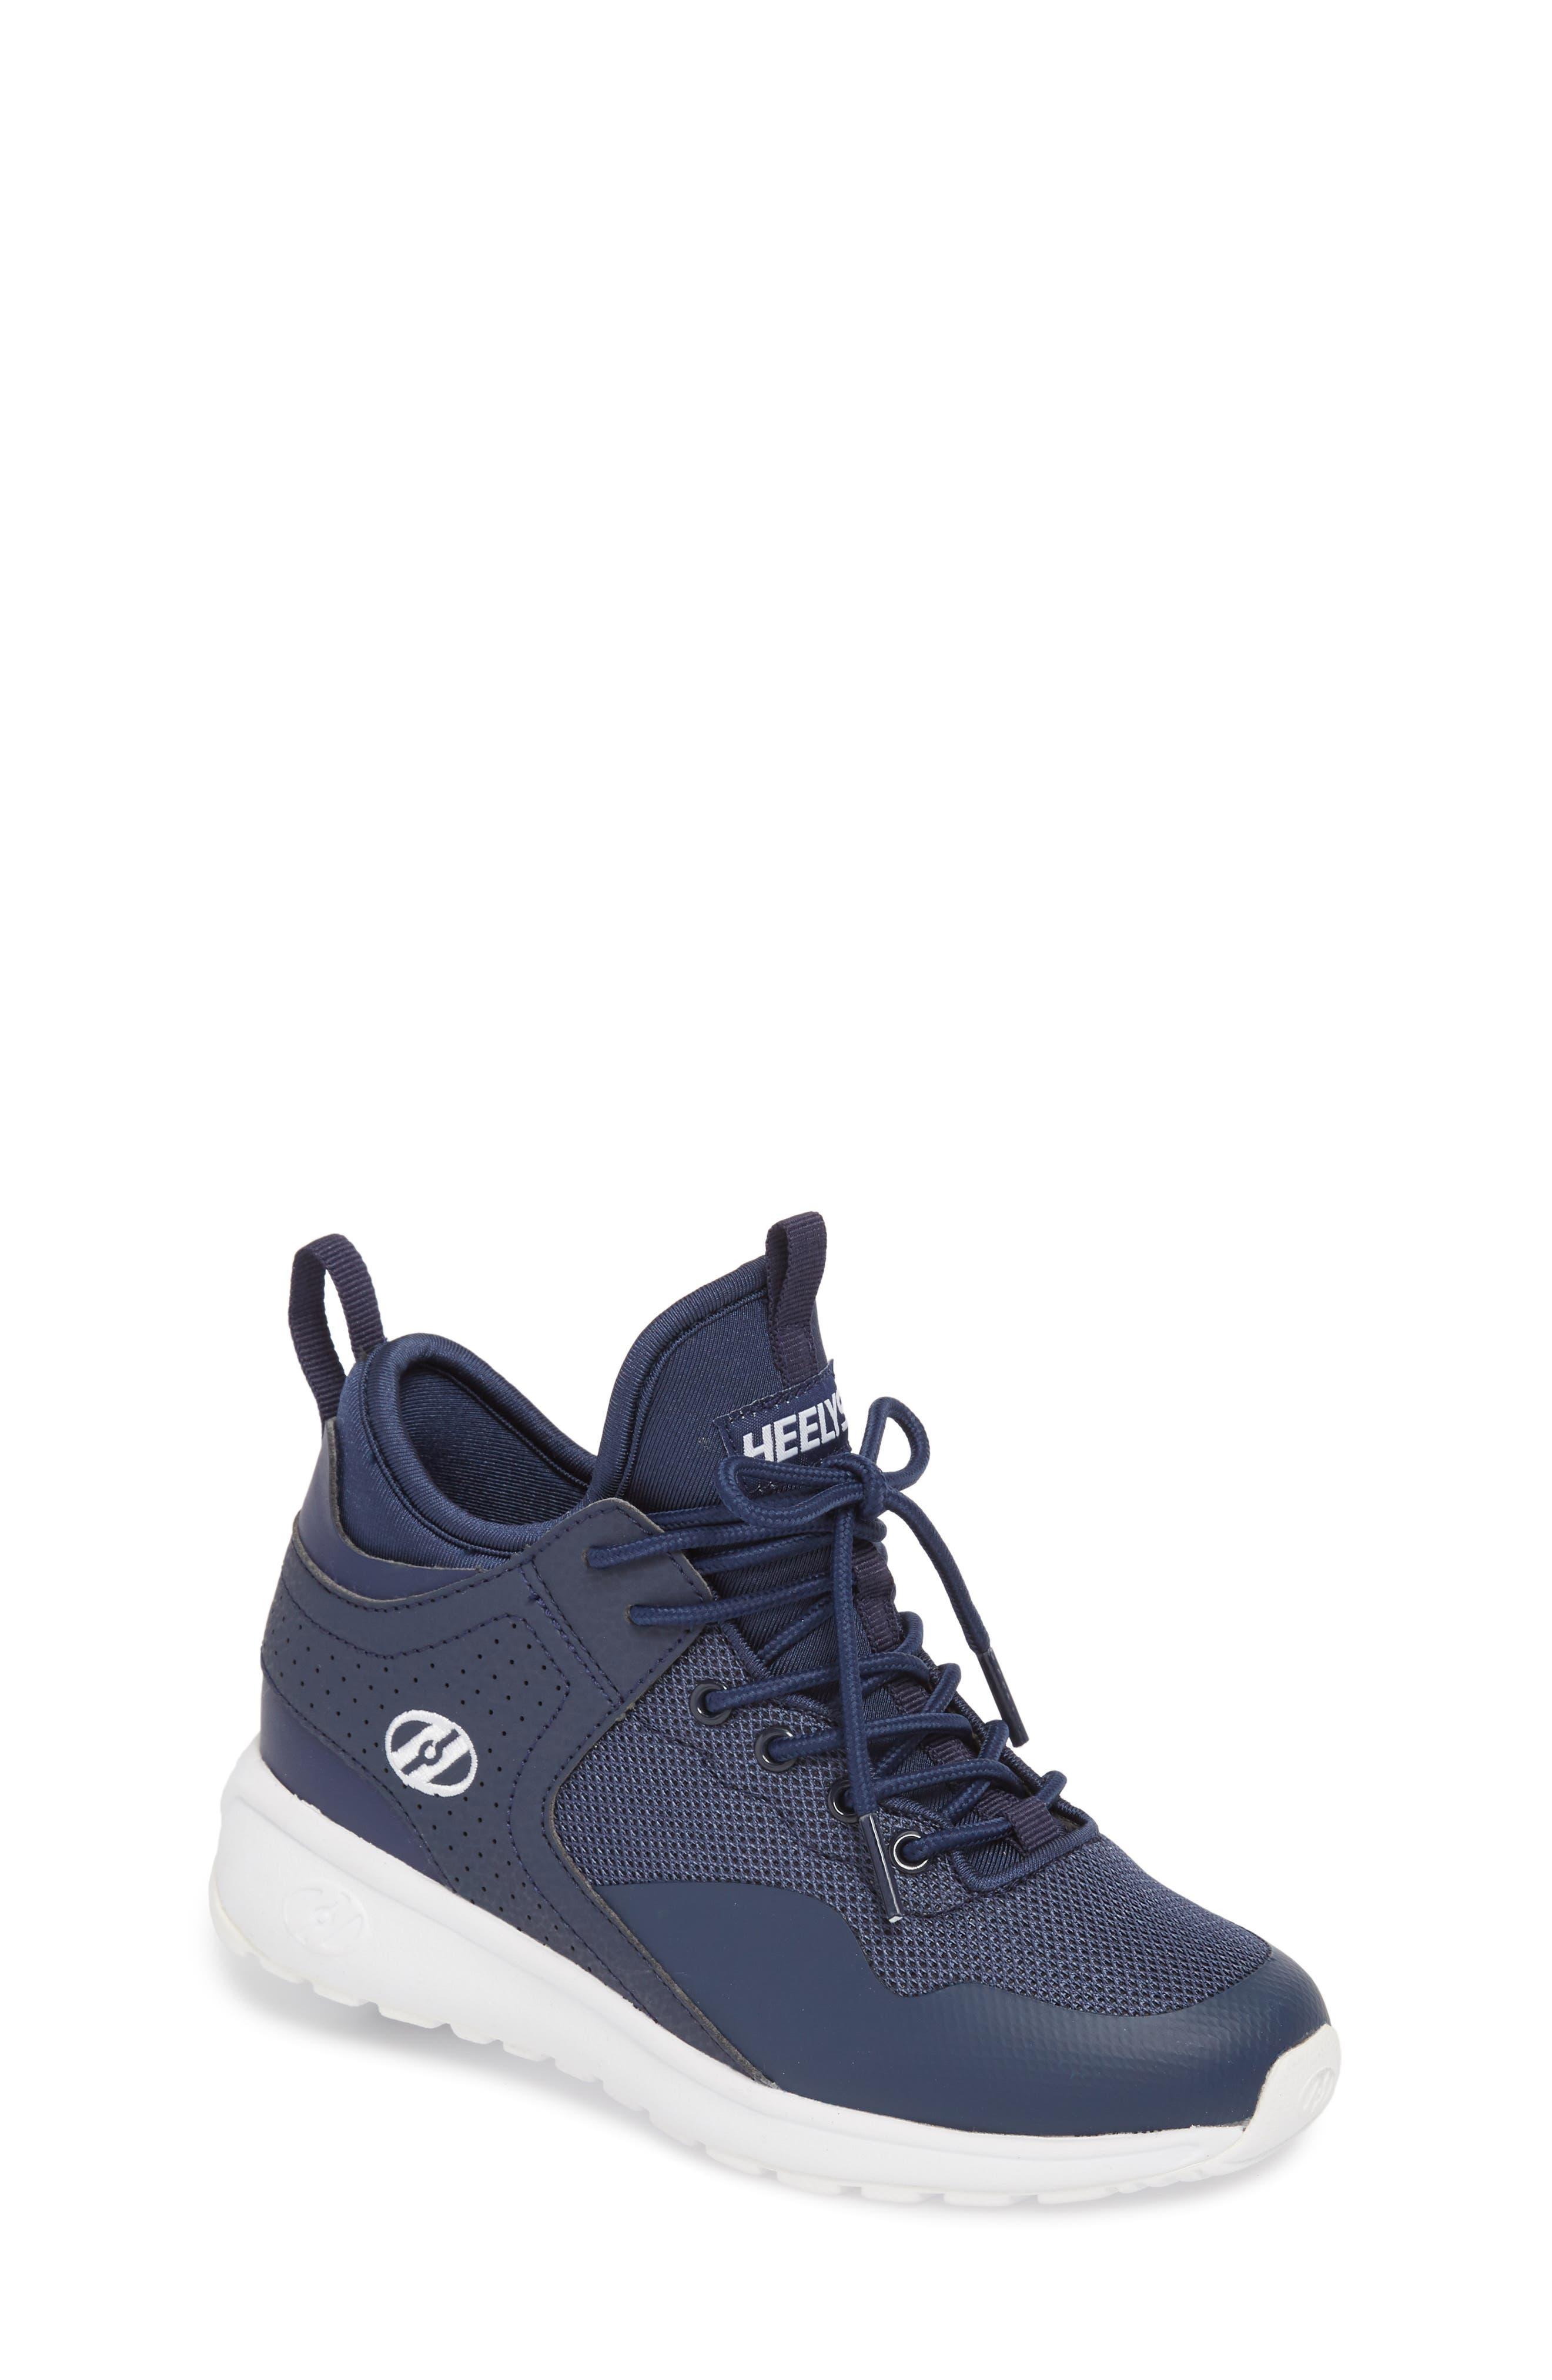 Piper Sneaker,                         Main,                         color, 411